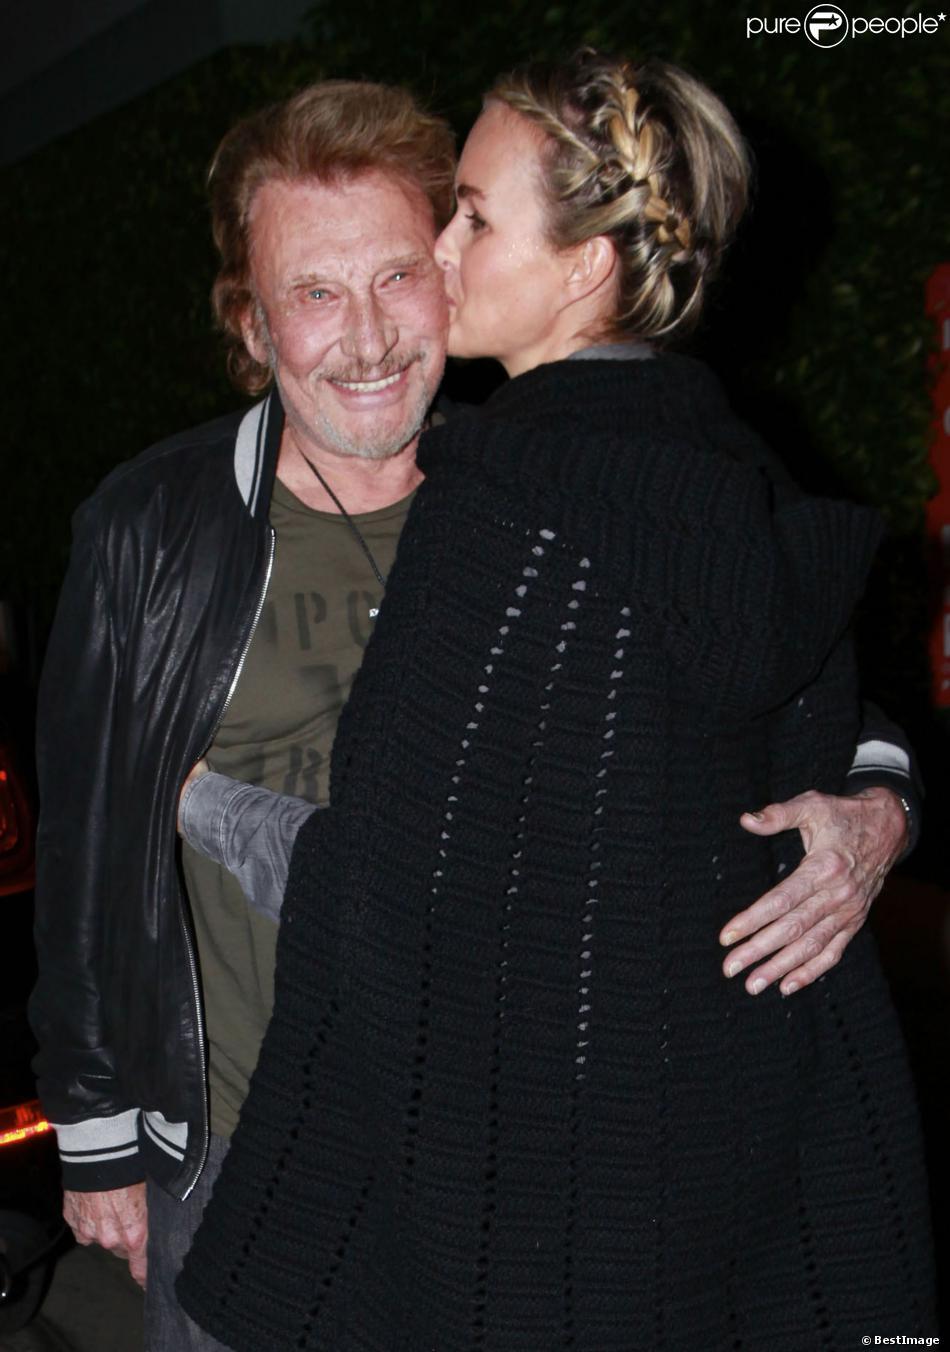 Johnny Hallyday et sa femme Laeticia au restaurent Giorgio Baldi à Los Angeles, le 1er décembre 2013.